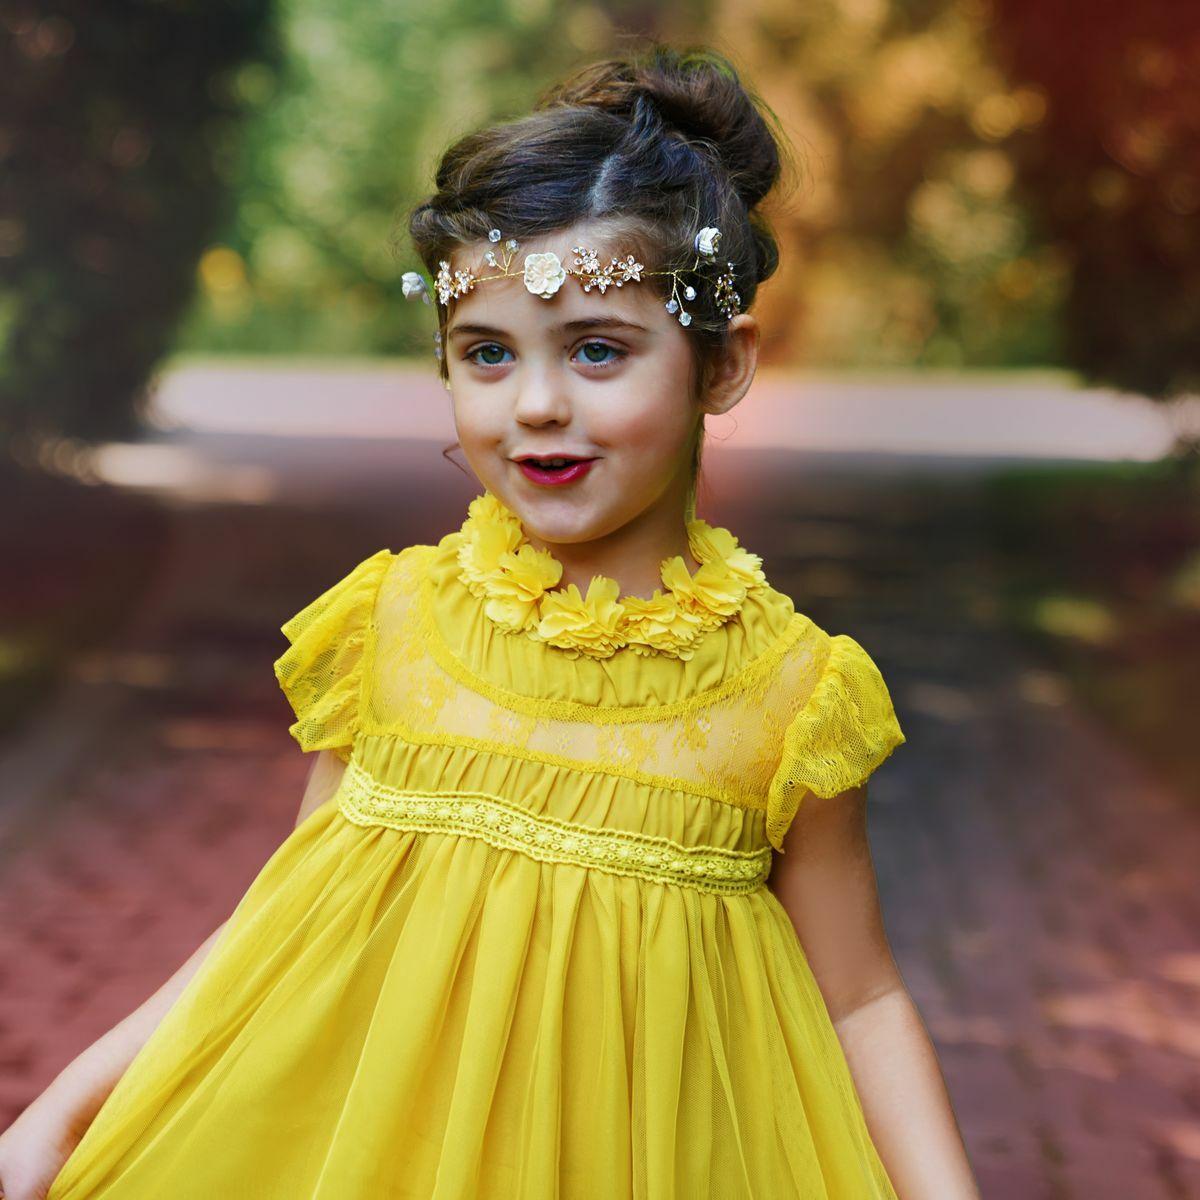 Bella Flora dress in mustard yellow